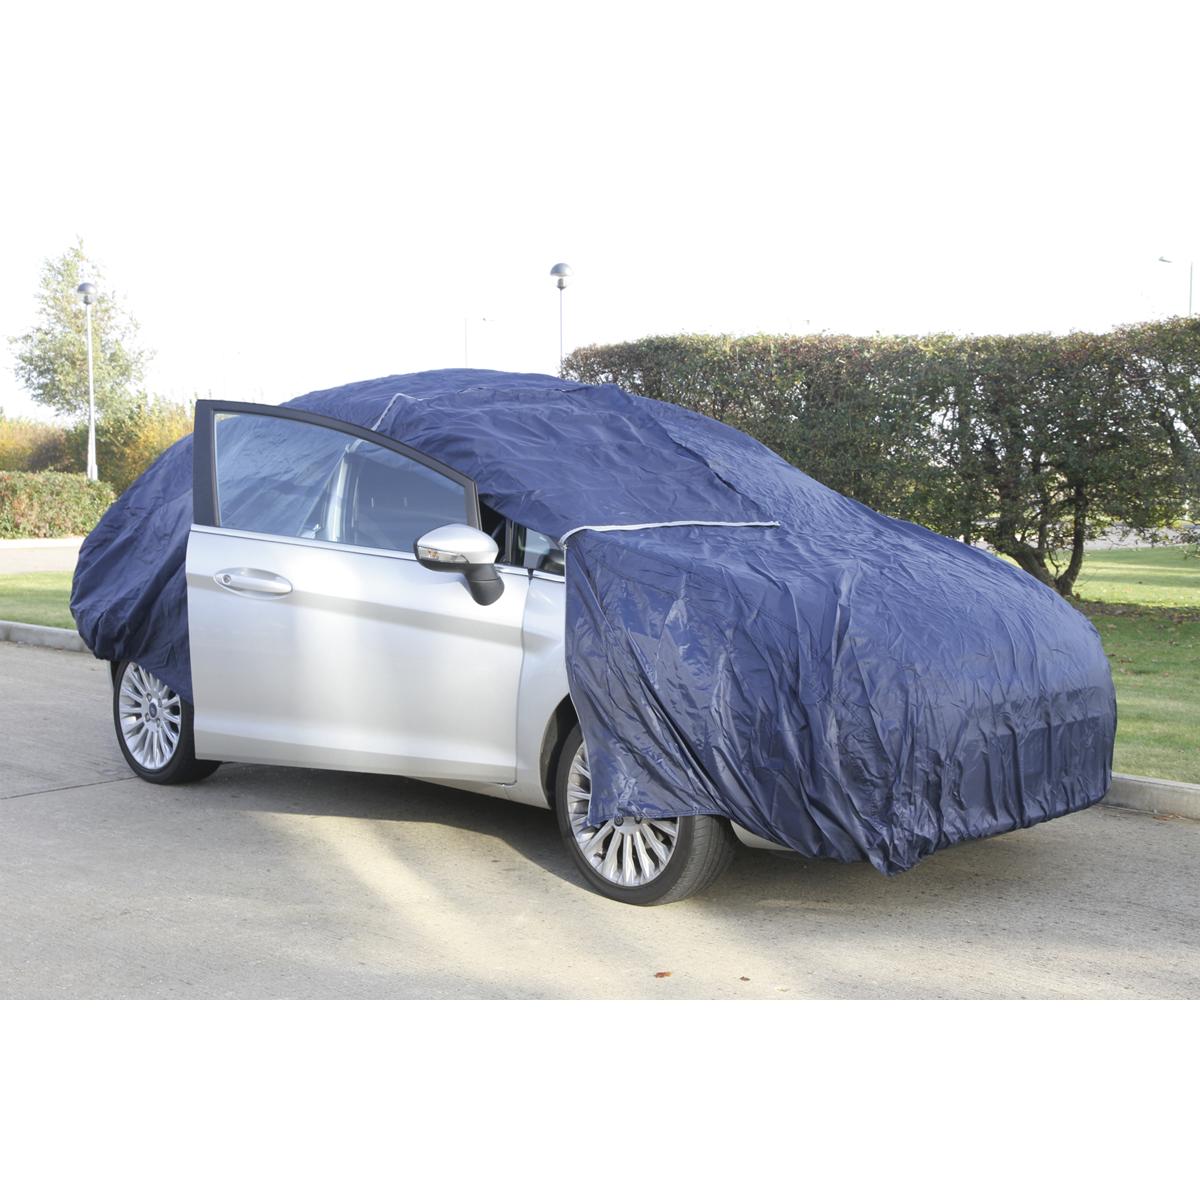 Car Cover Lightweight X-Large 4830 x 1780 x 1220mm